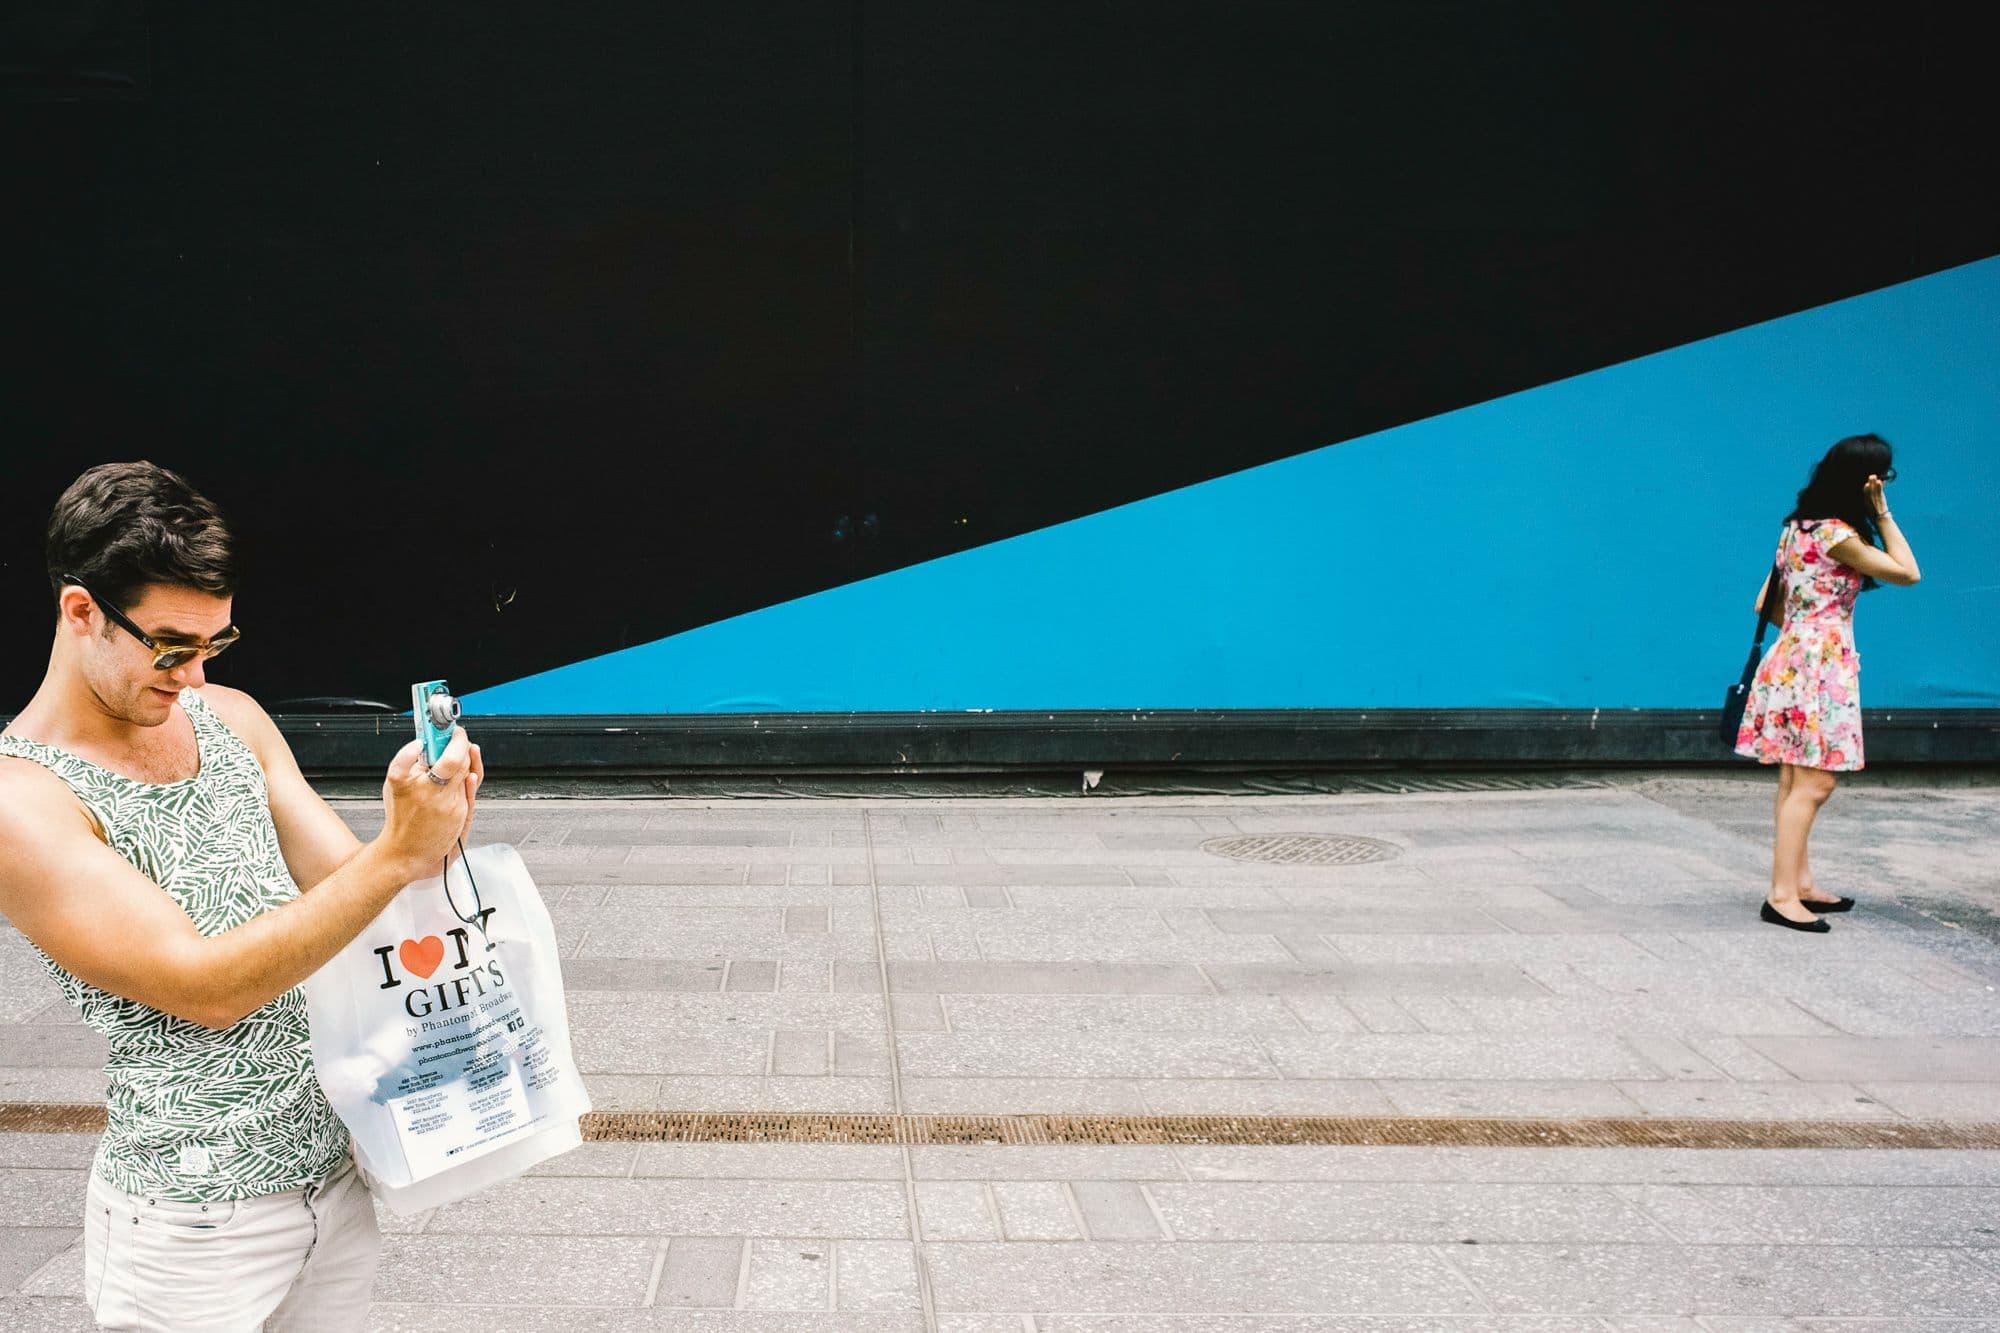 Jonathan Higbee Straßenfotografie